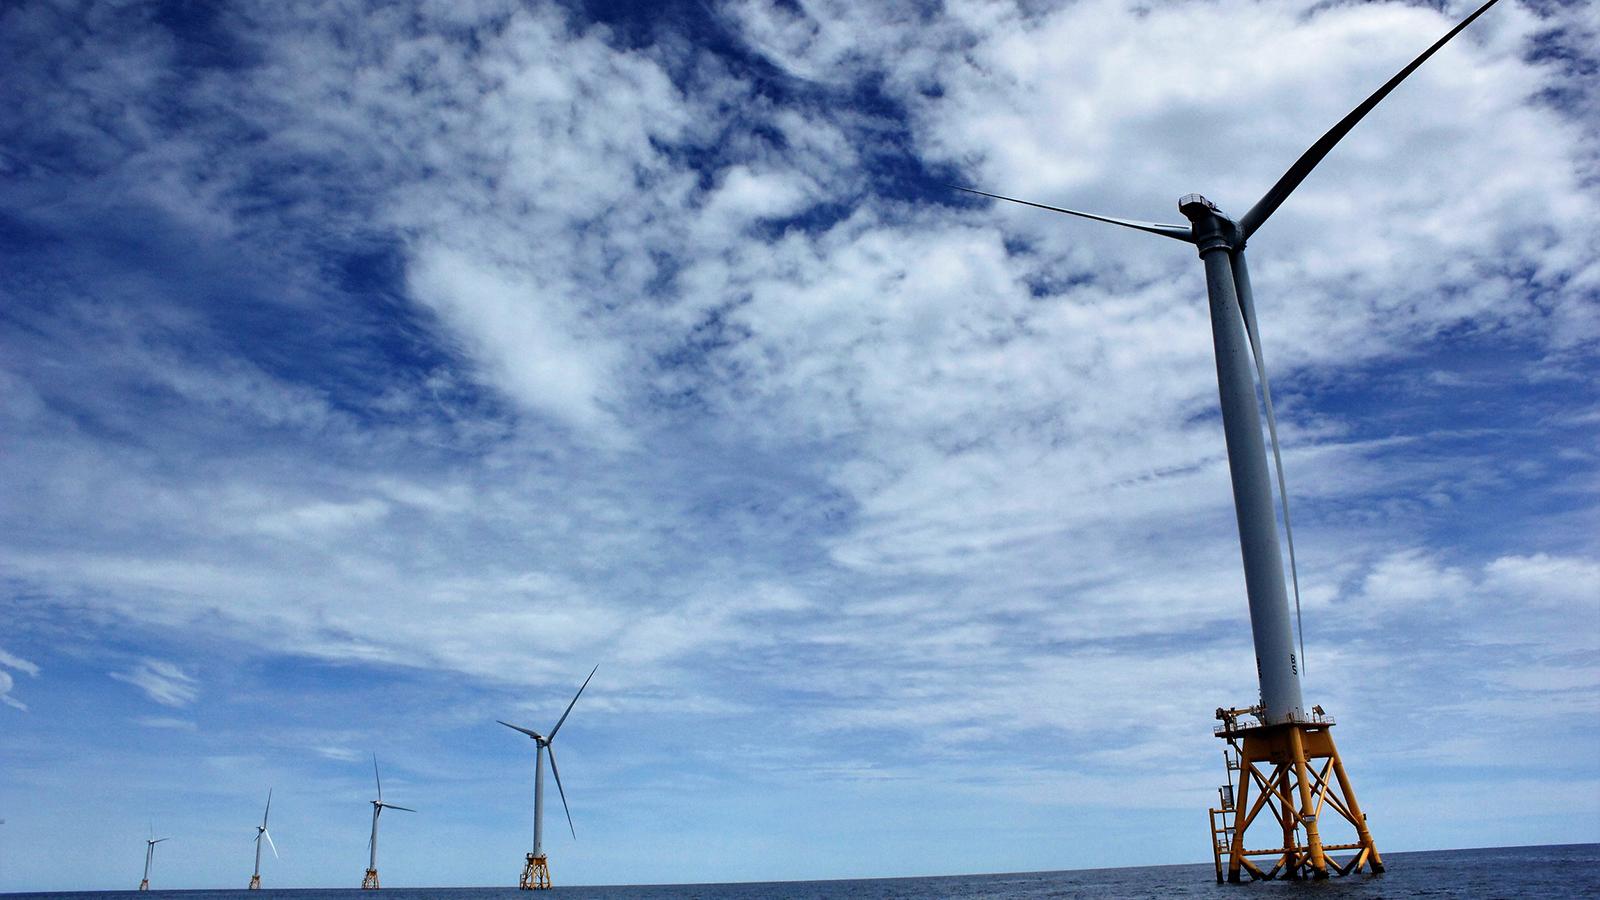 Block Island wind farm in Rhode Island. (Photo by Molly A. Seltzer)